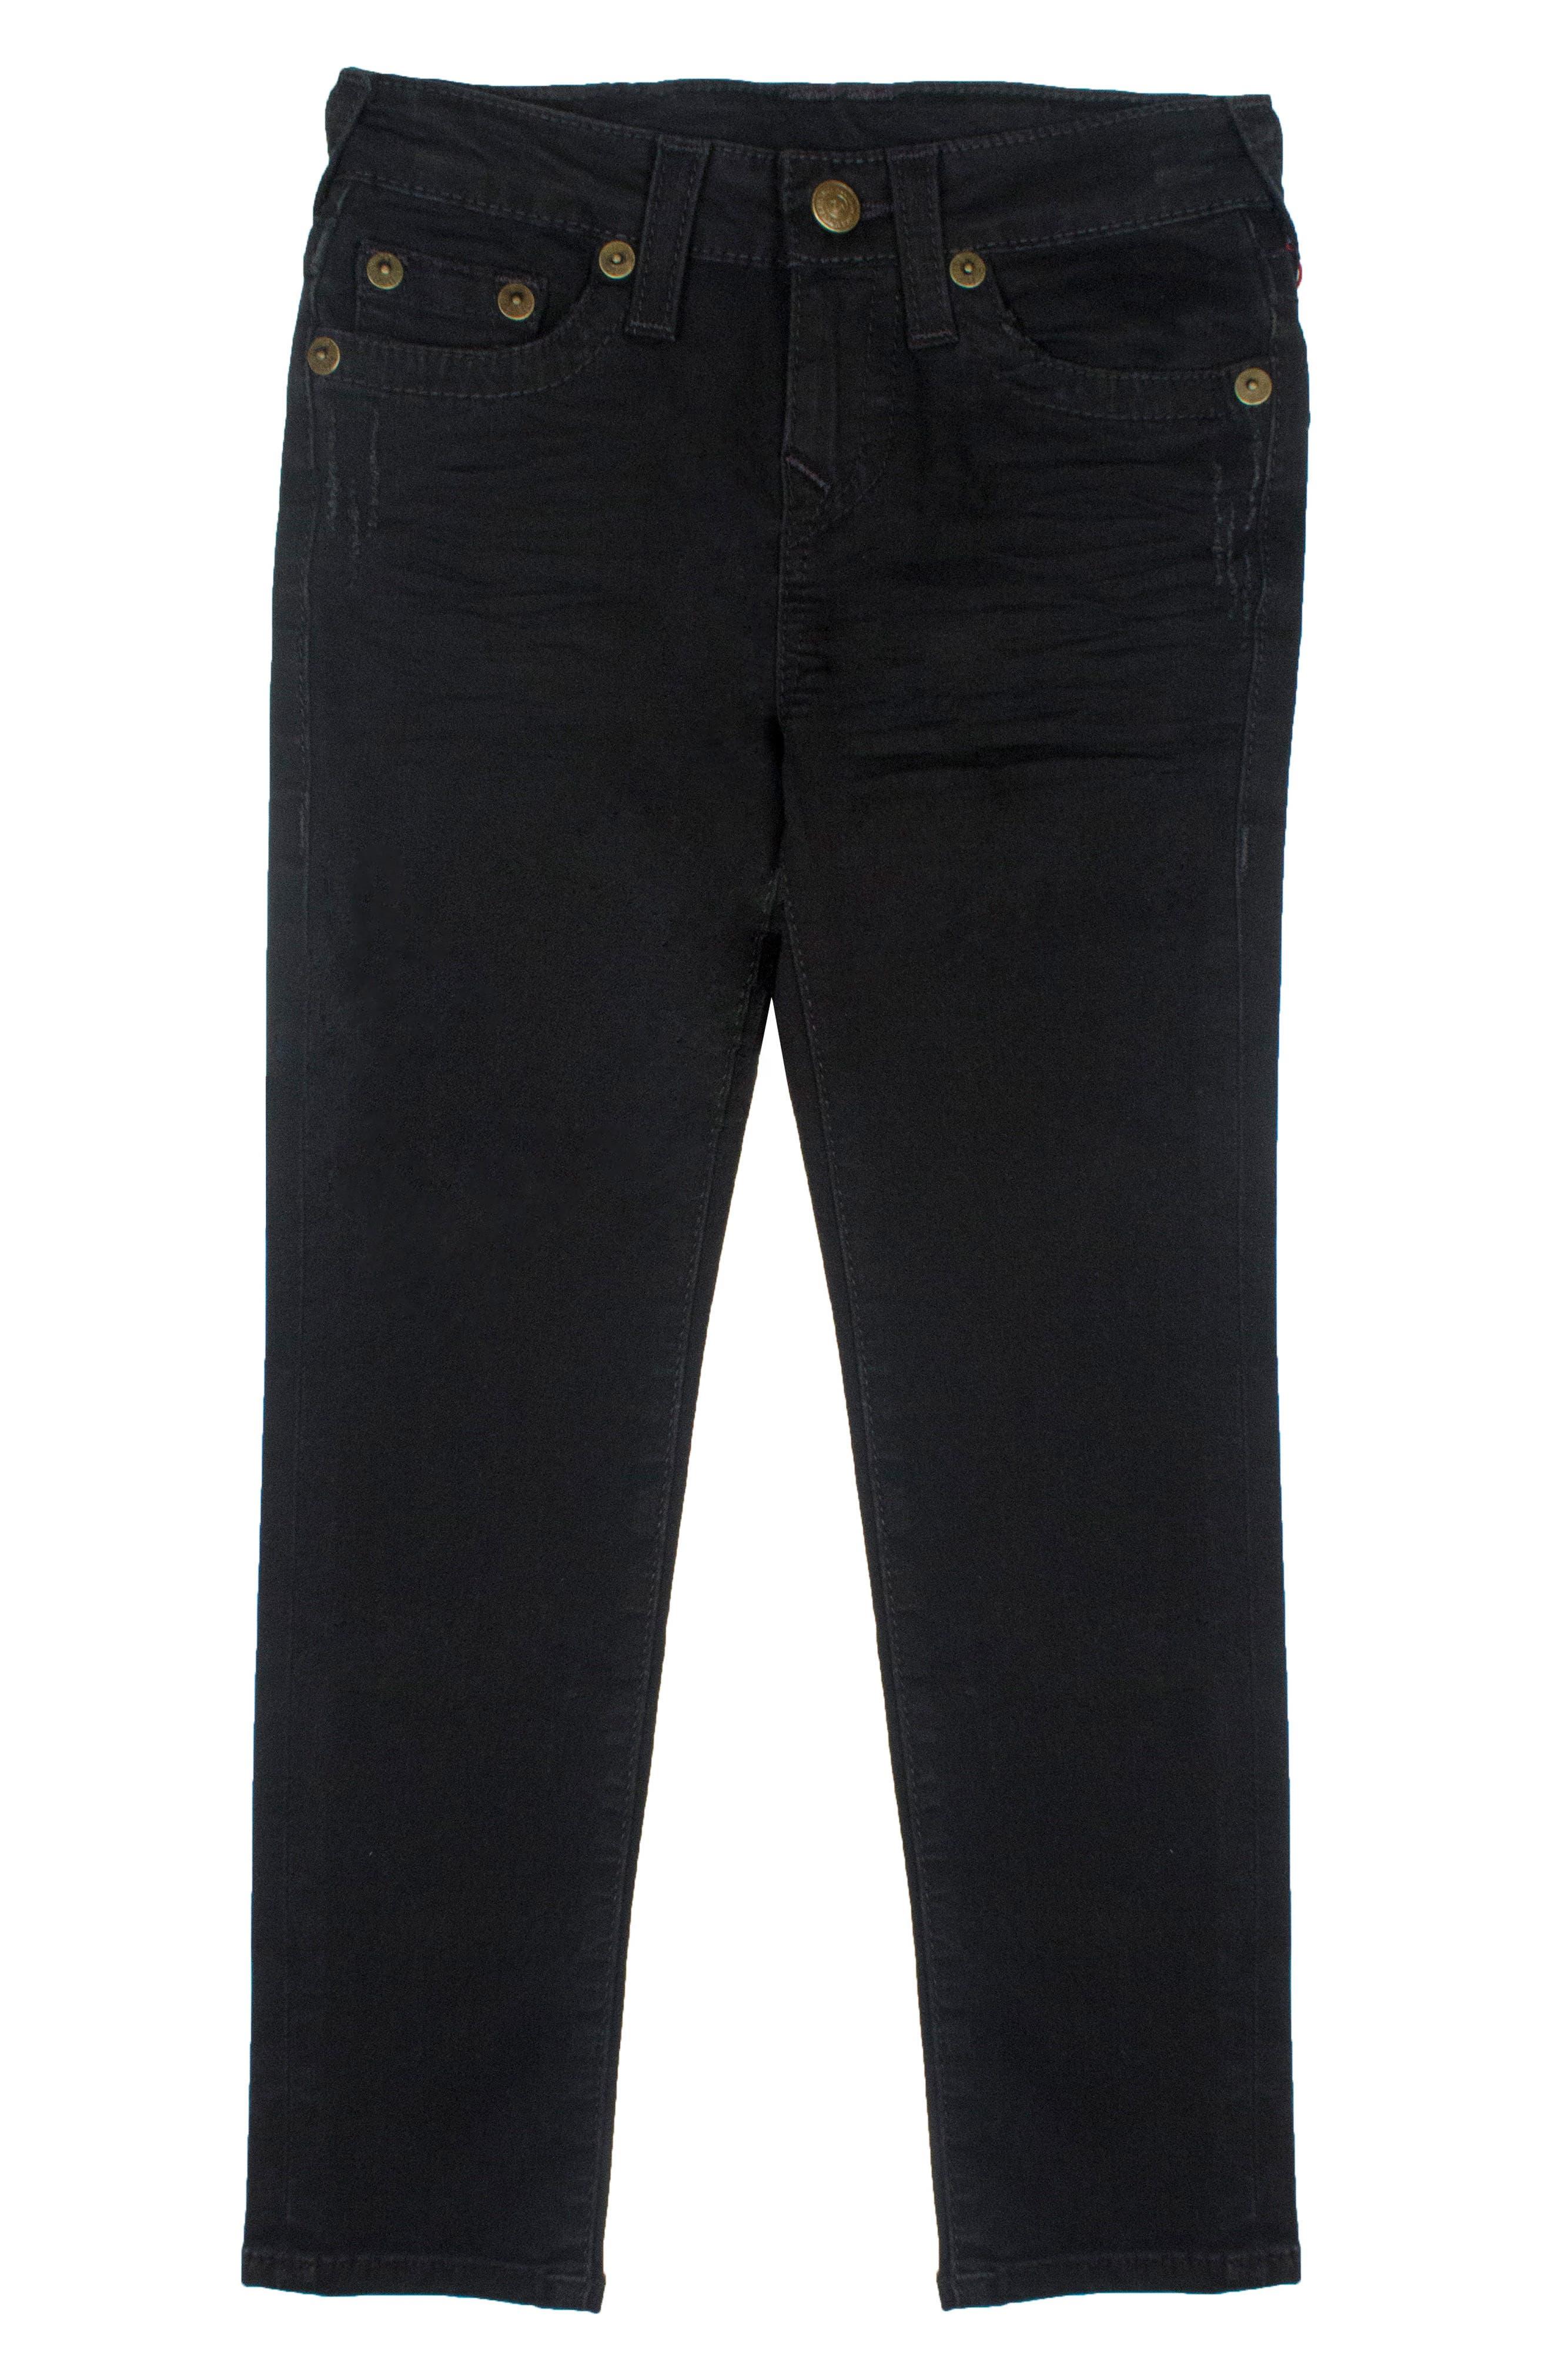 Geno Single End Jeans,                         Main,                         color, Uk Black